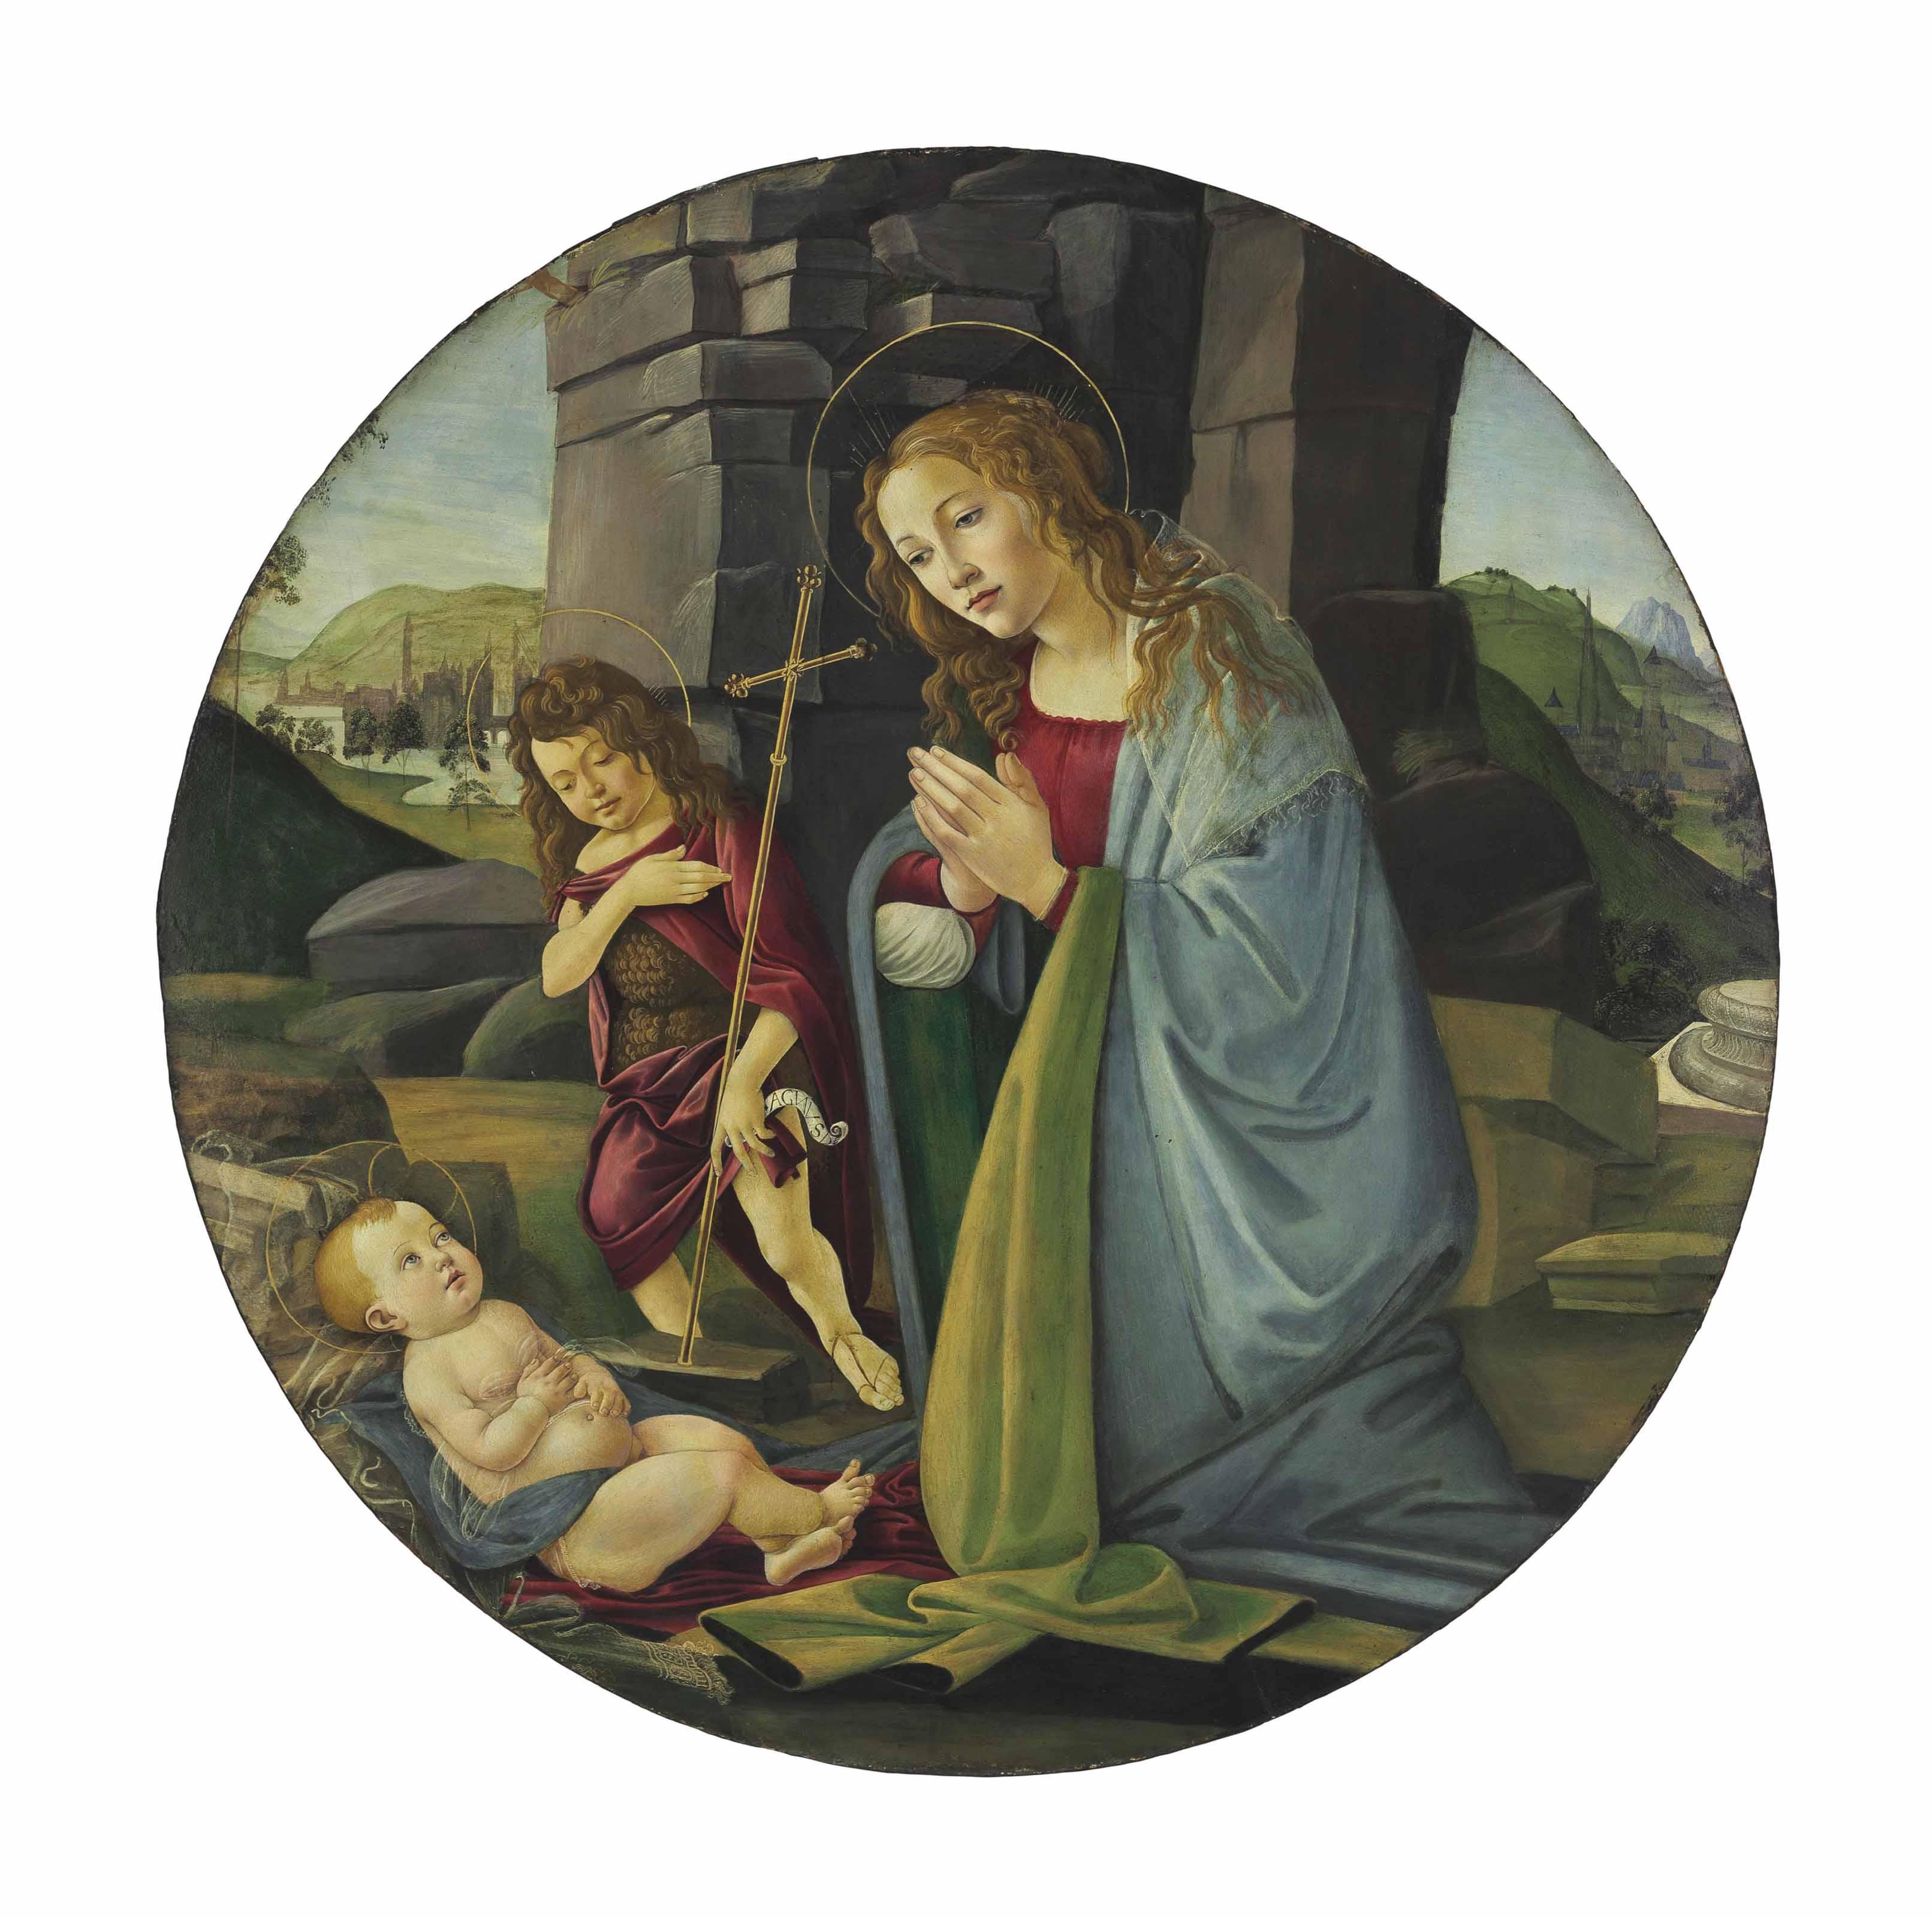 Alessandro Filipepi, called Sandro Botticelli (Florence 1444/45 ...